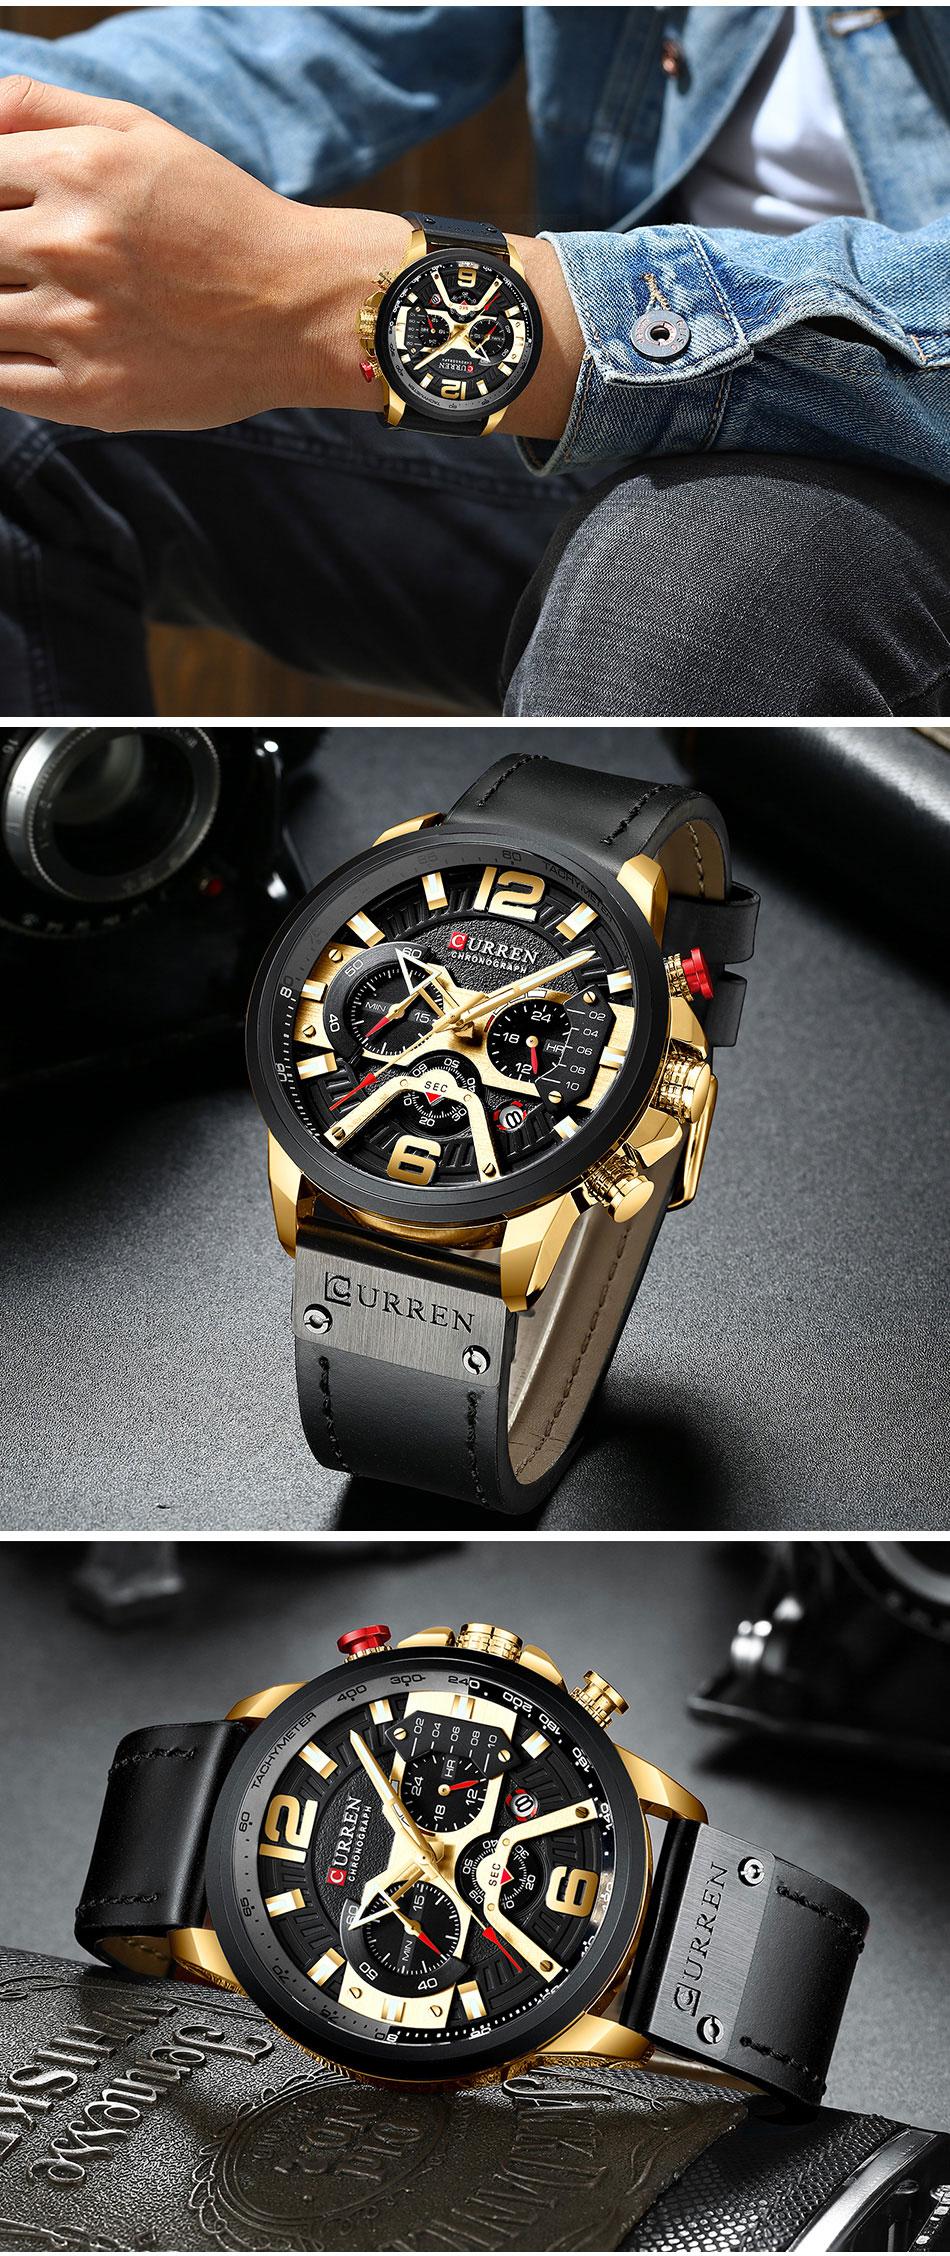 HTB1Qi 9VNnaK1RjSZFtq6zC2VXau CURREN Luxury Brand Men Analog Leather Sports Watches Men's Army Military Watch Male Date Quartz Clock Relogio Masculino 2019